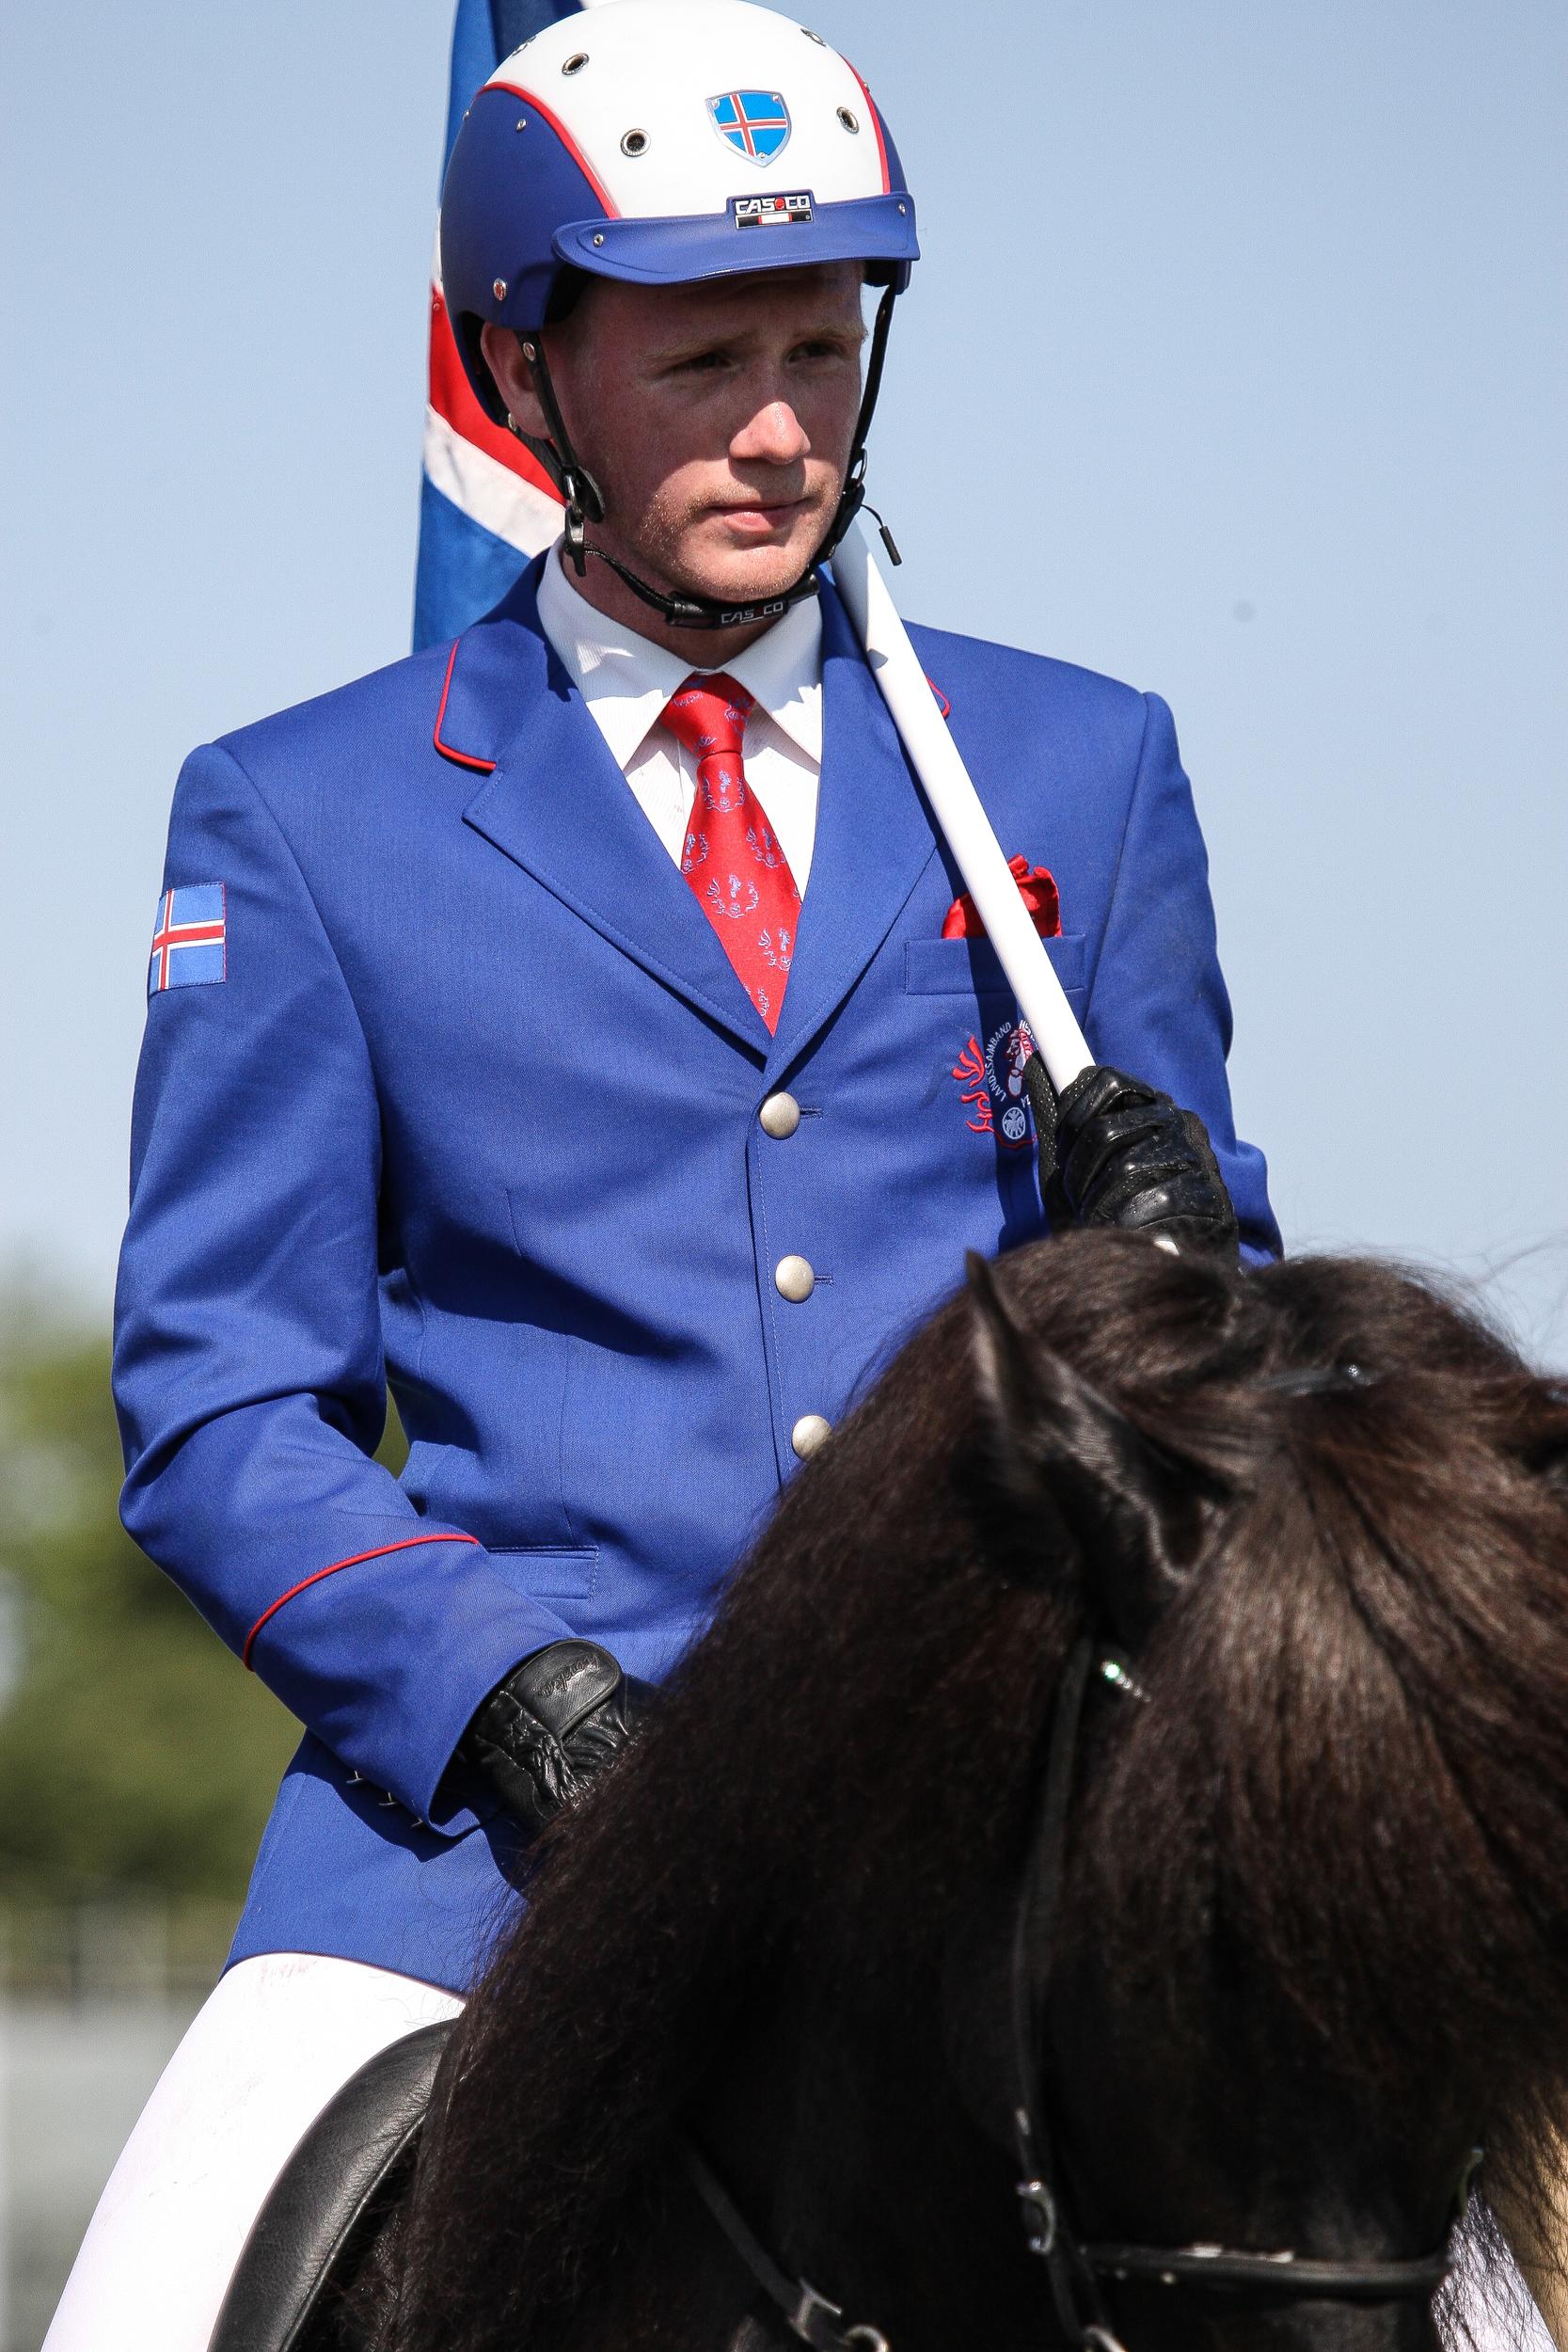 Arnar Bjarki WM 2013 (1).JPG